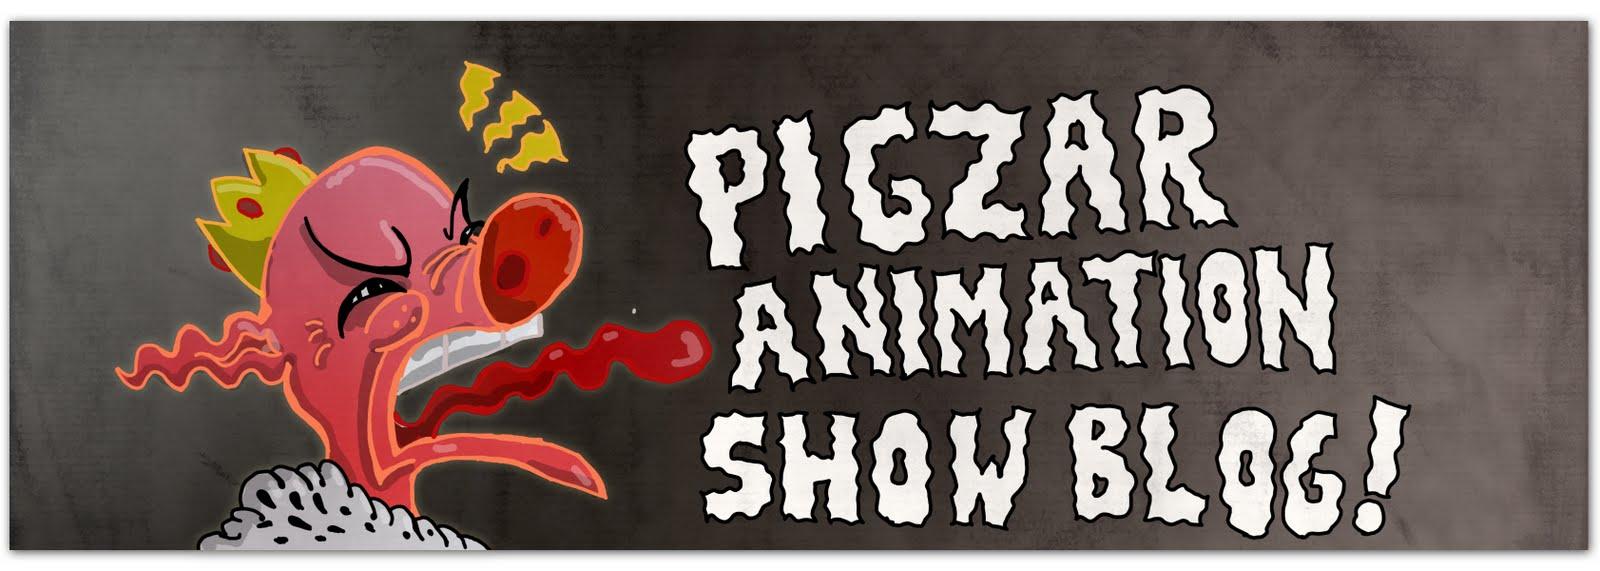 Pig-Zar! Animation Show!